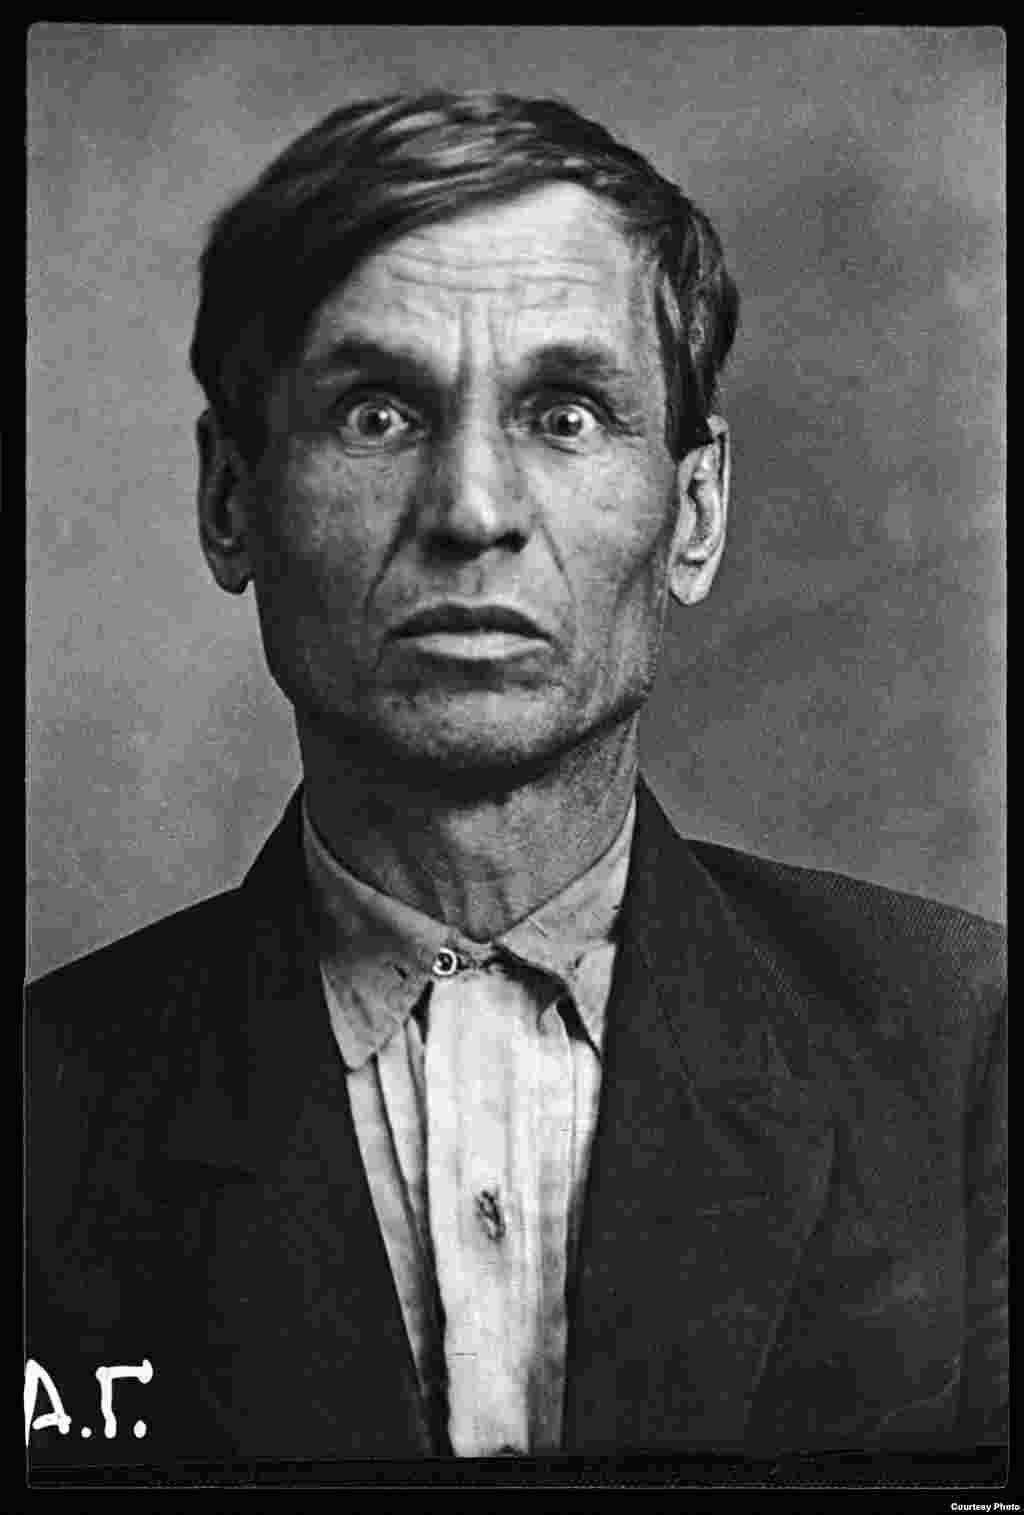 Aleksei Zheltikov: Russian, born 1890, locksmith at the Moscow Metro workshops. Shot on November 1, 1937.